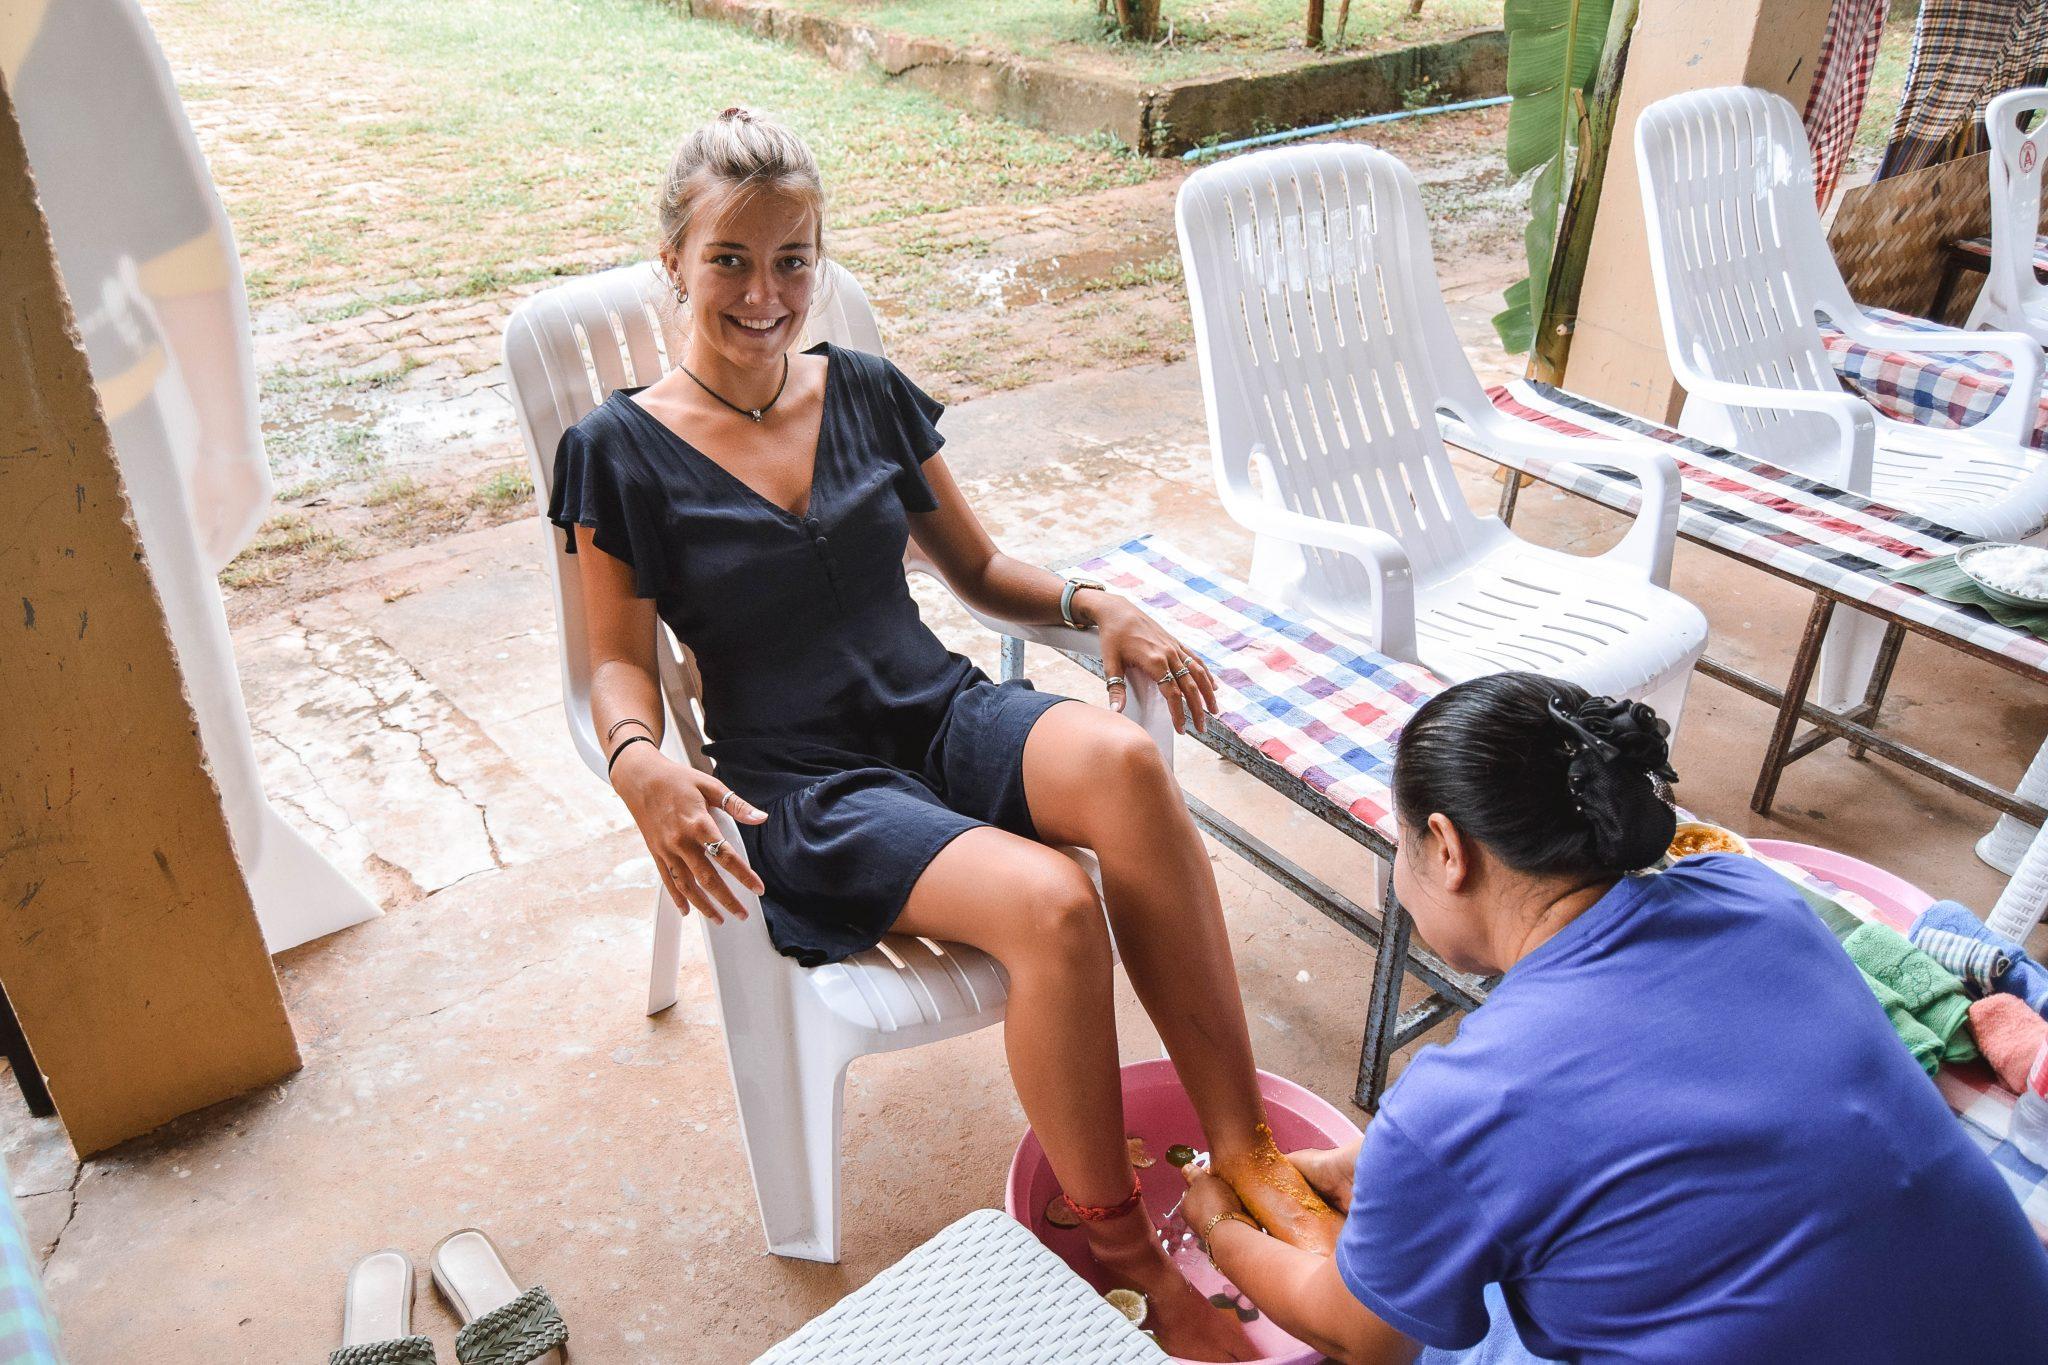 Wanderers & Warriors - Charlie & Lauren UK Travel Couple - 7 Things To Do In Nakhon Phanom Thai Foot Massage